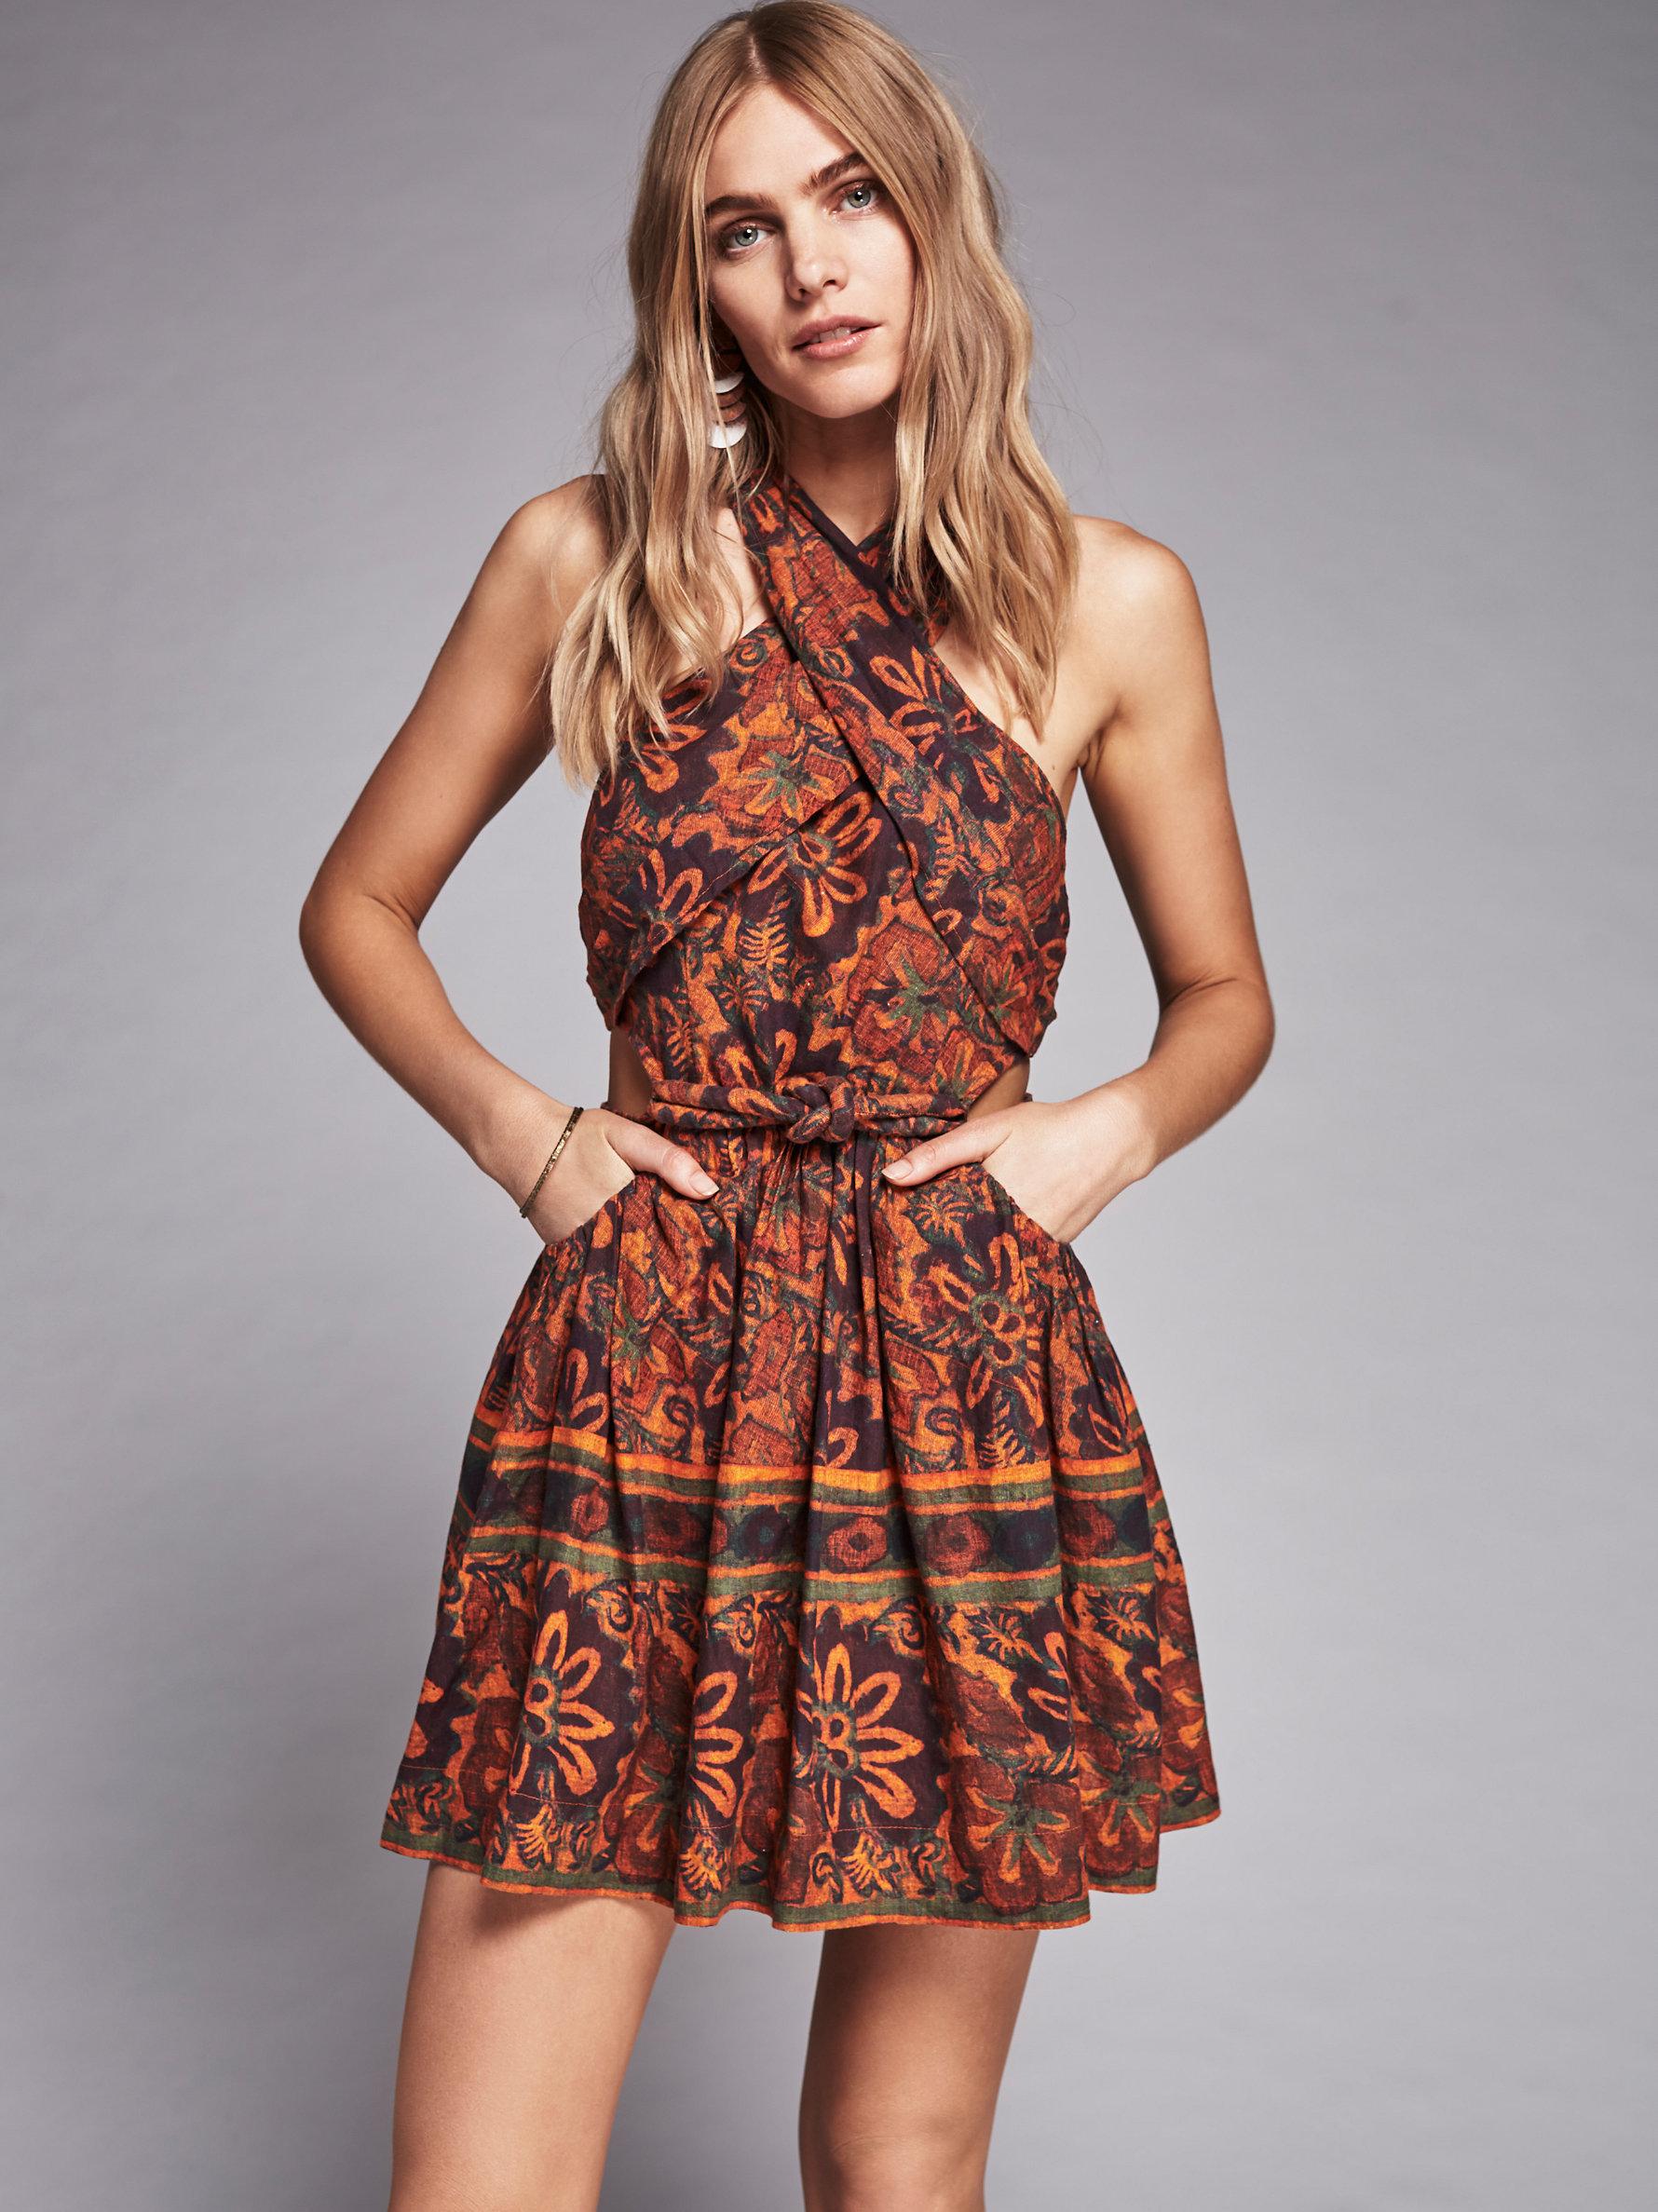 Free People New Romantics Lazy Luau Dress In Brown